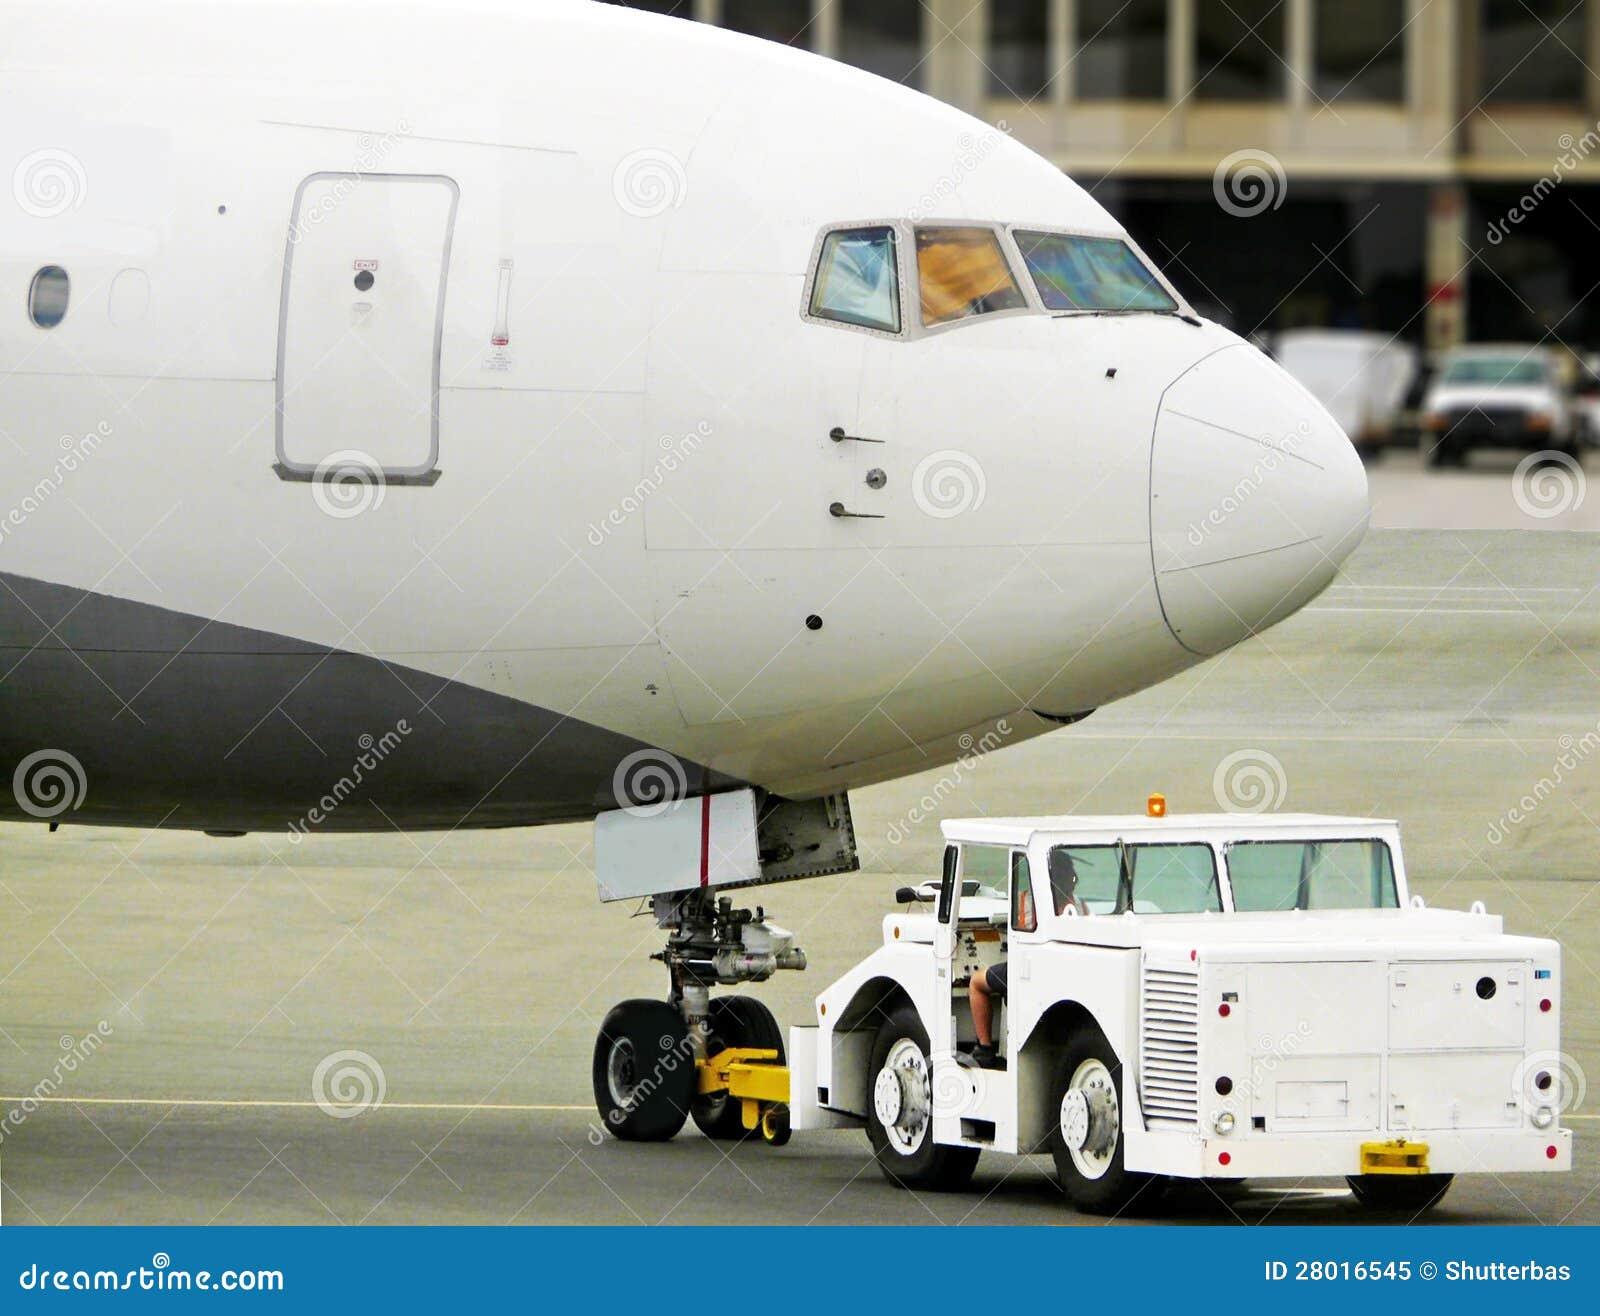 plane push back stock image image of airport depart 28016545